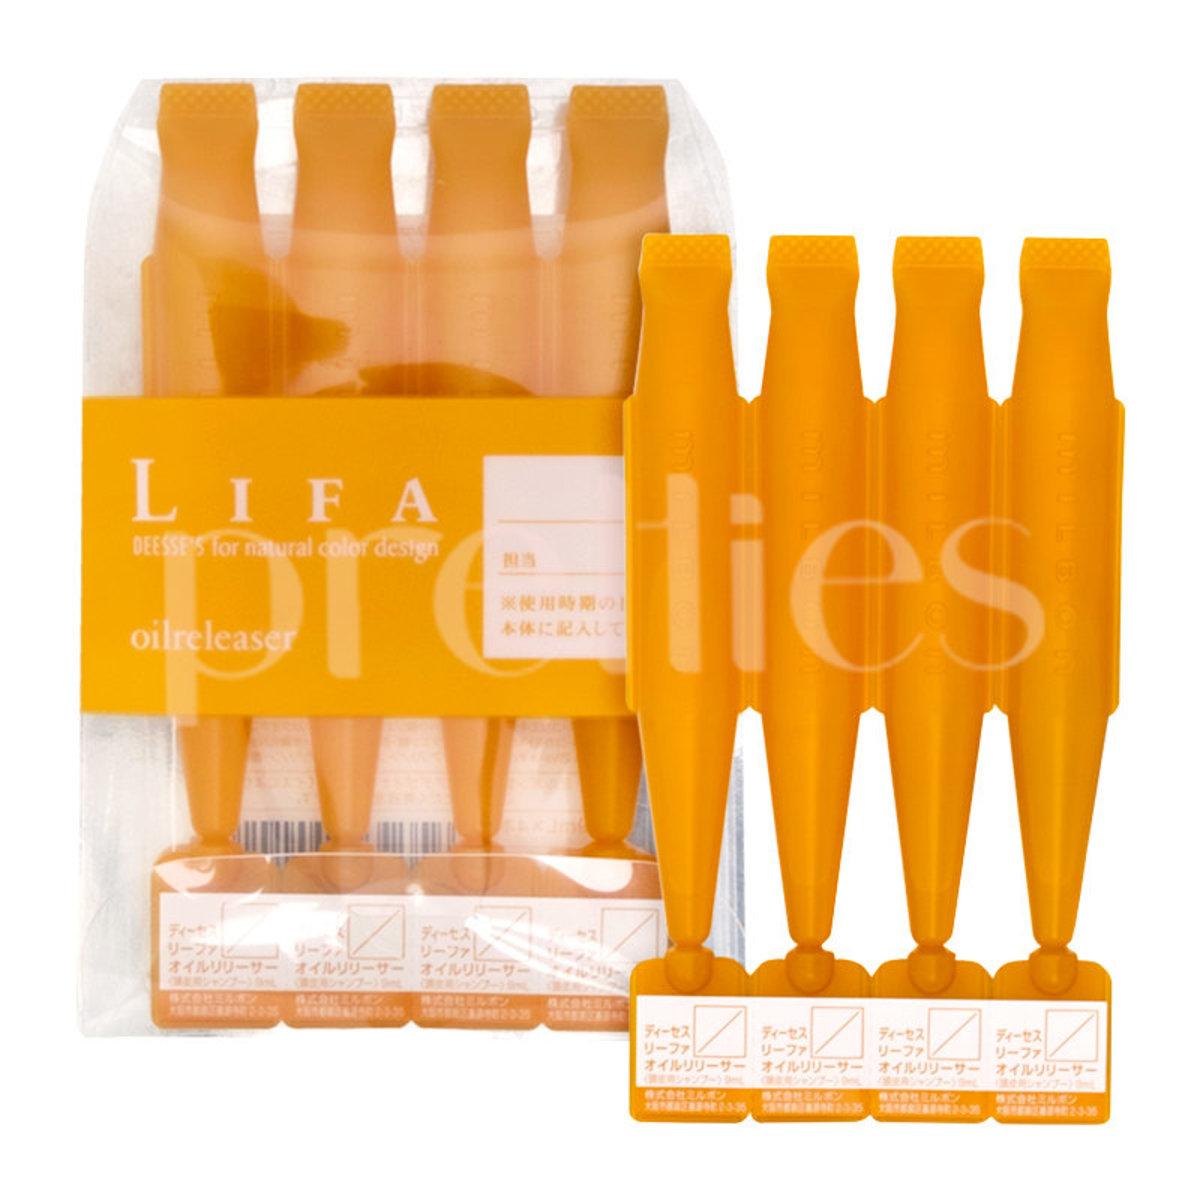 Lifa Deesse's For Natural Color Design Oilreleaser (9ml x4) Orange (4954835290142)  (Parallel Import